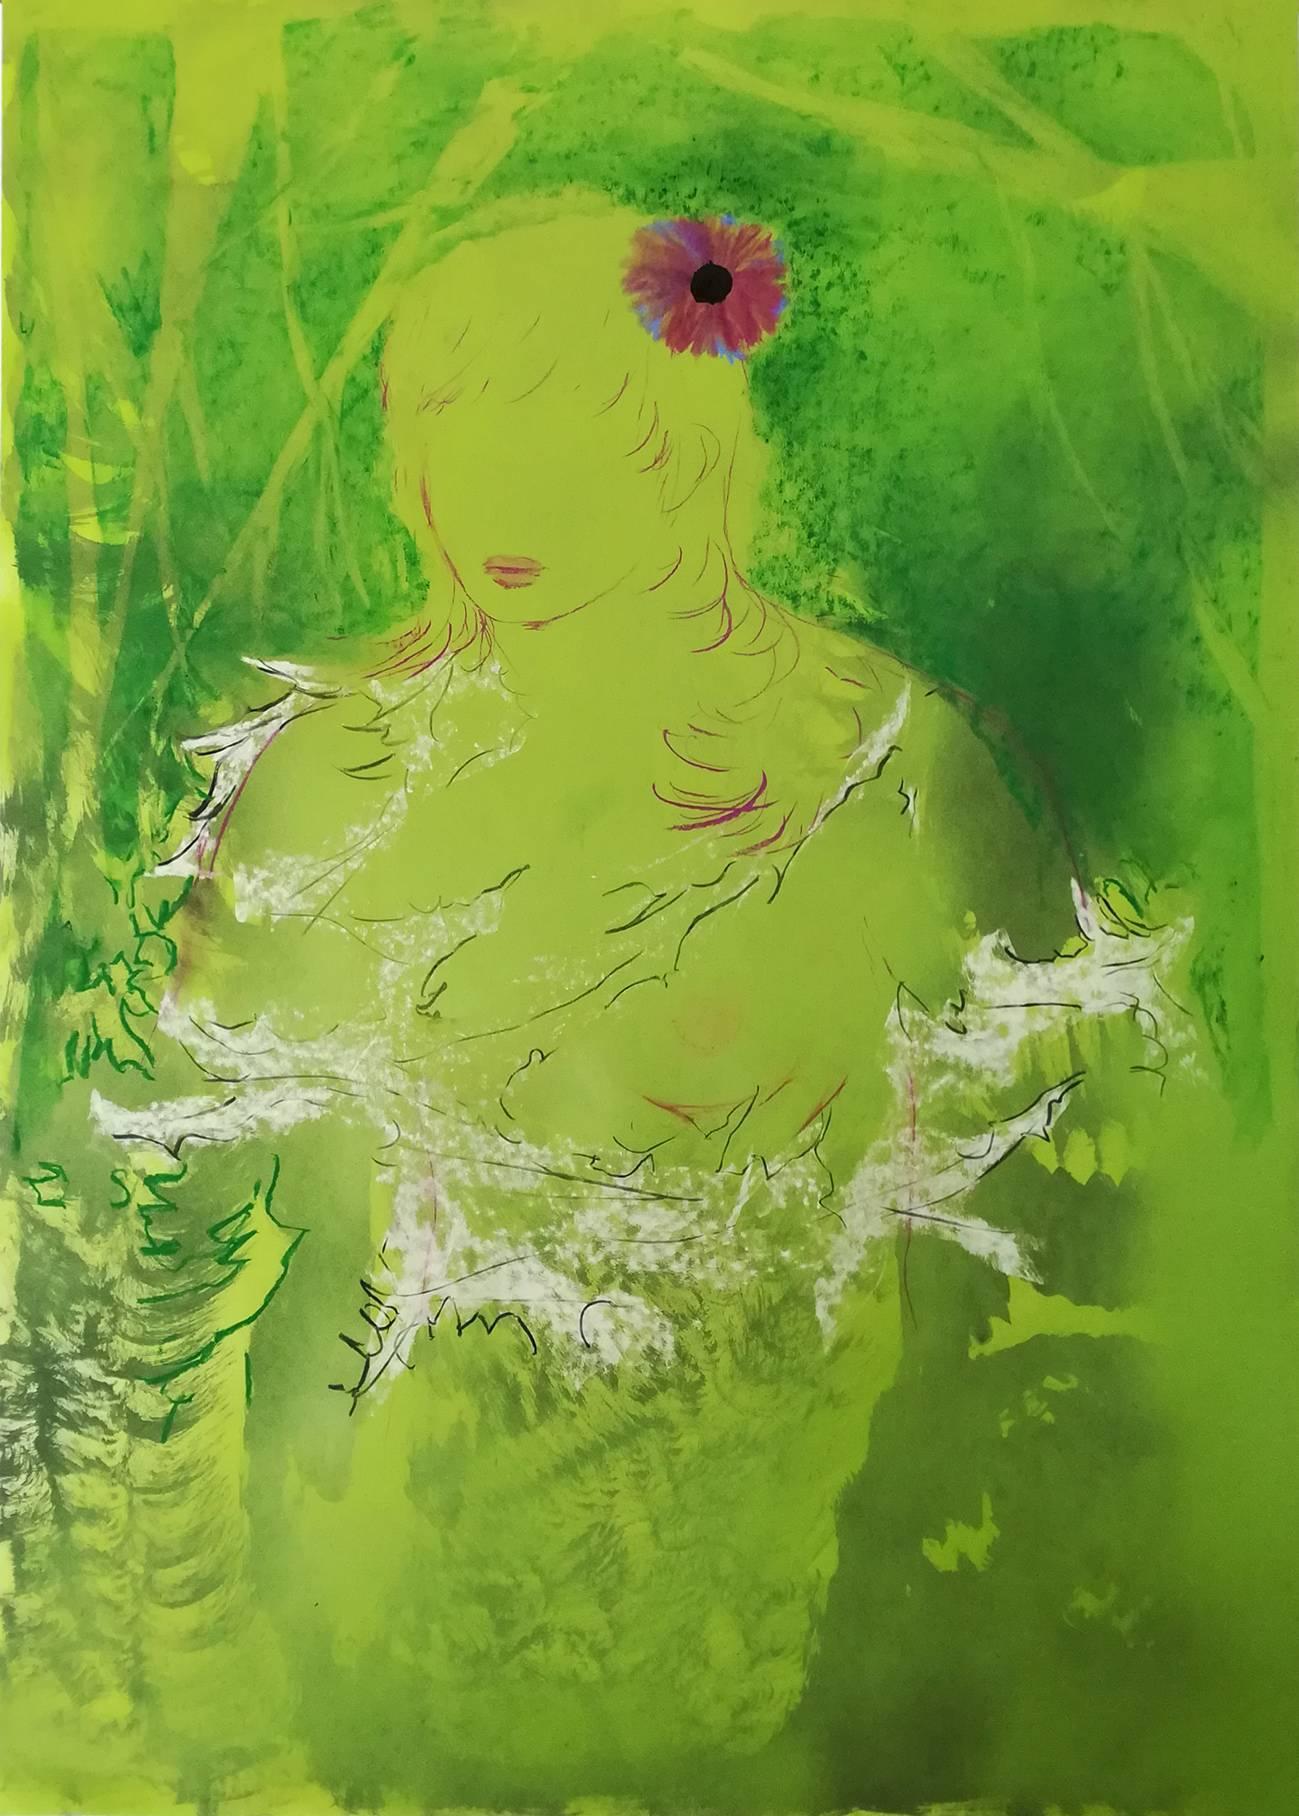 Eduardo Infante, Blonde She Hulk, 2017